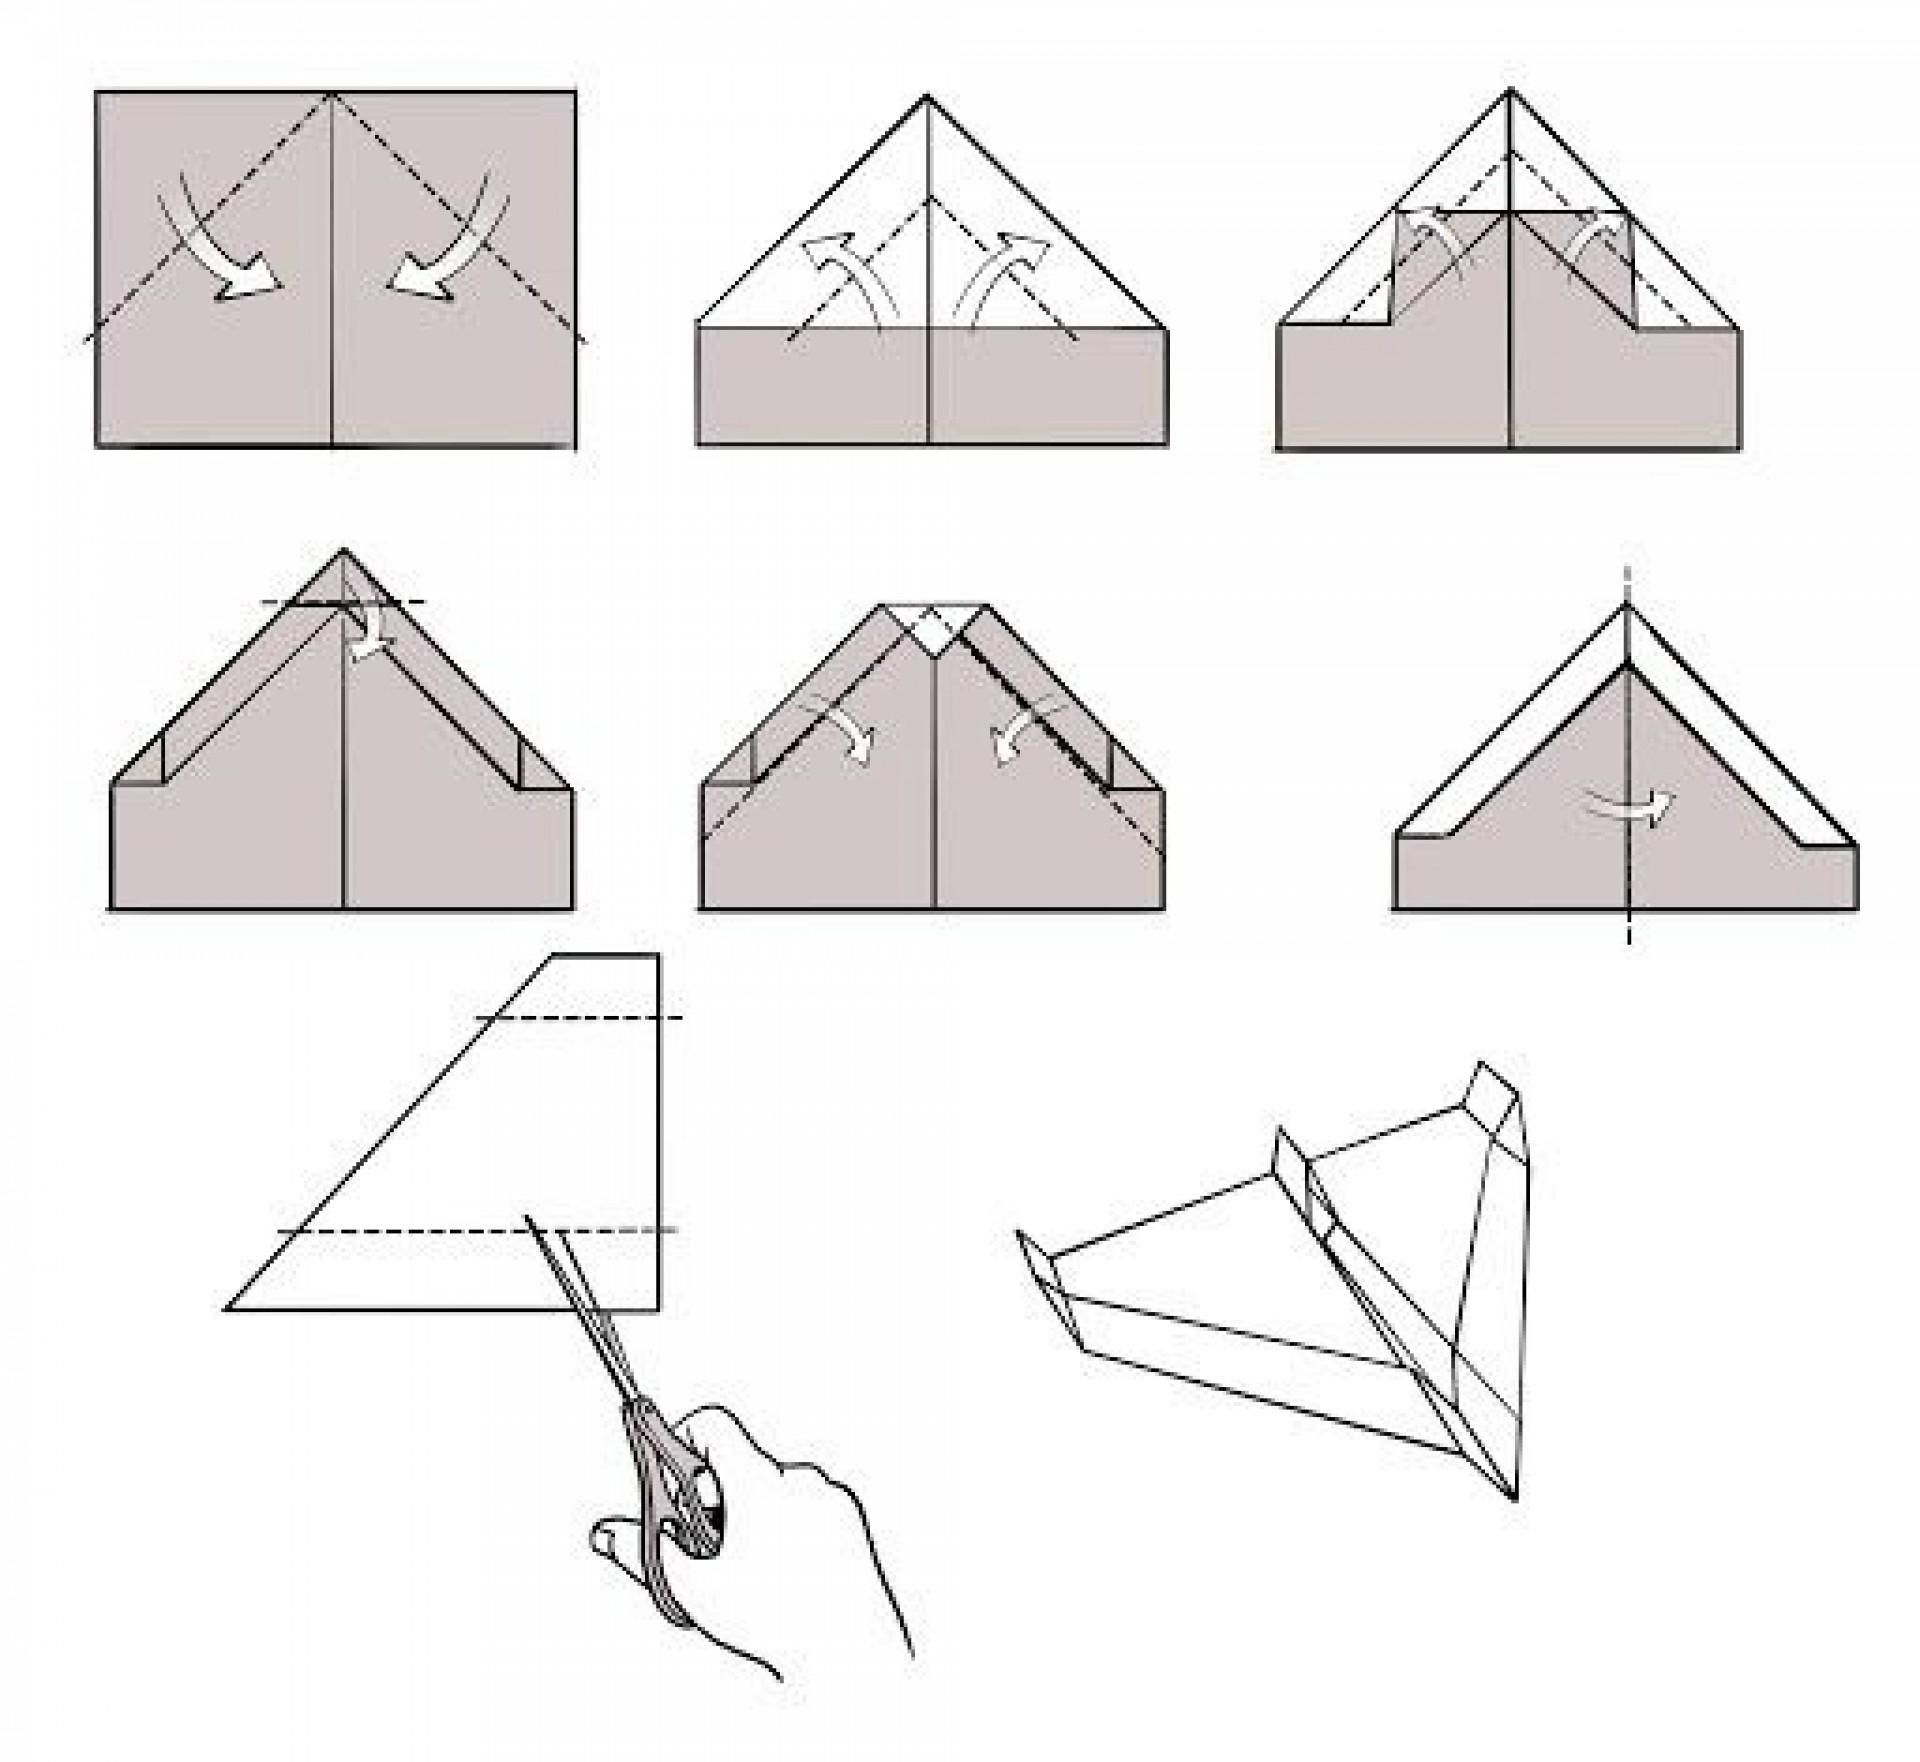 009 Awesome Printable Paper Plane Plan Photo  Plans Airplane Free Design Instruction1920